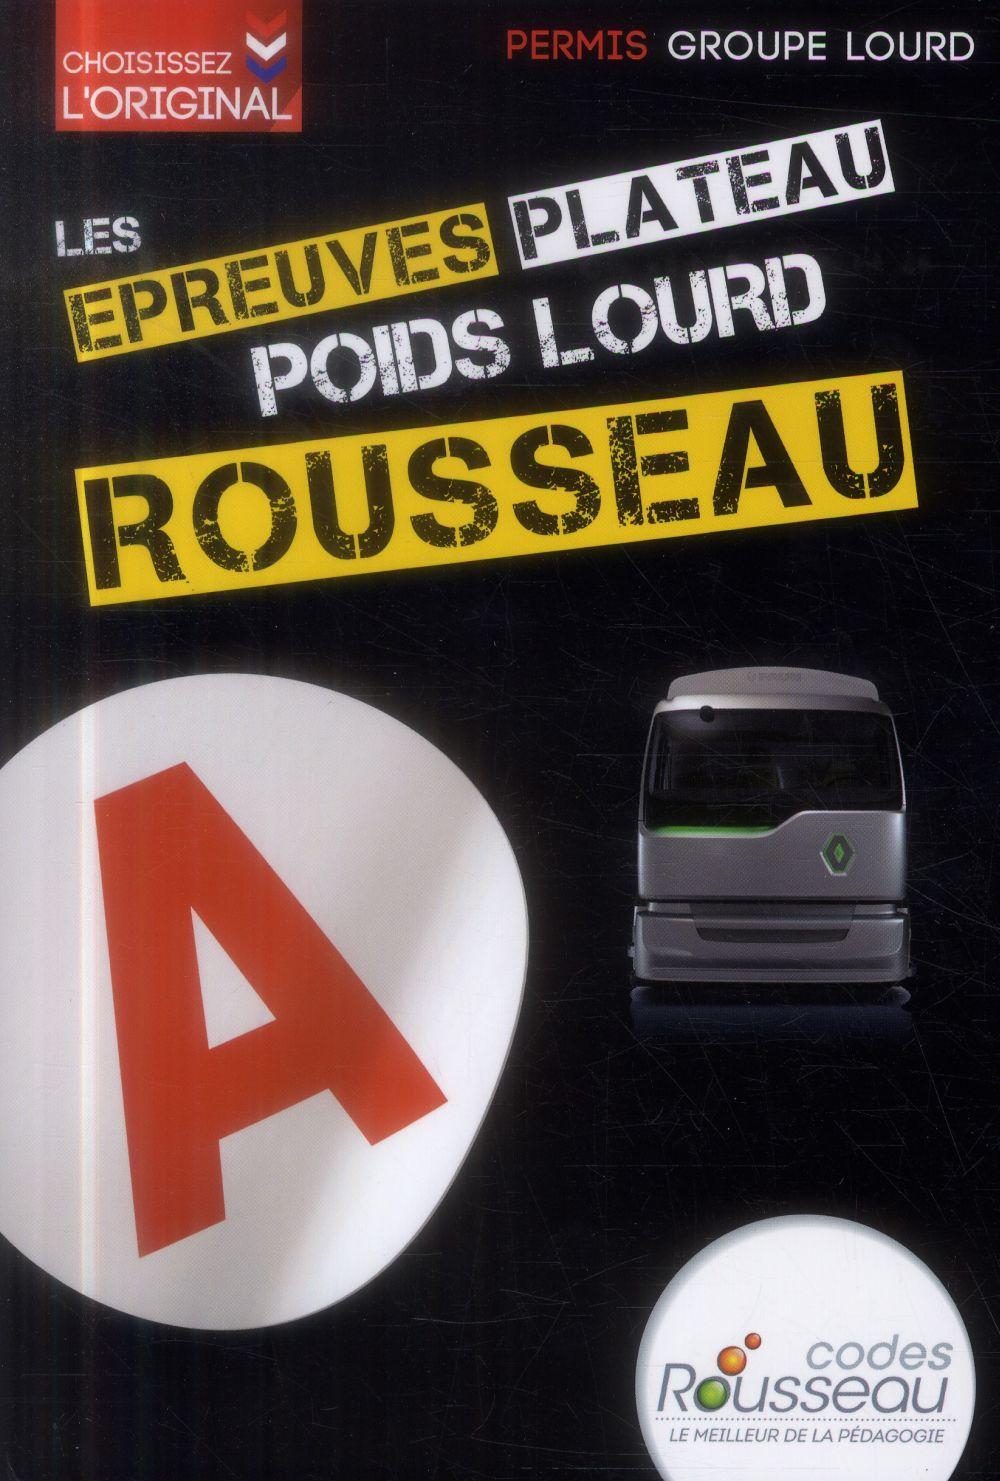 CODE ROUSSEAU ORAL POIDS LOURD 2014